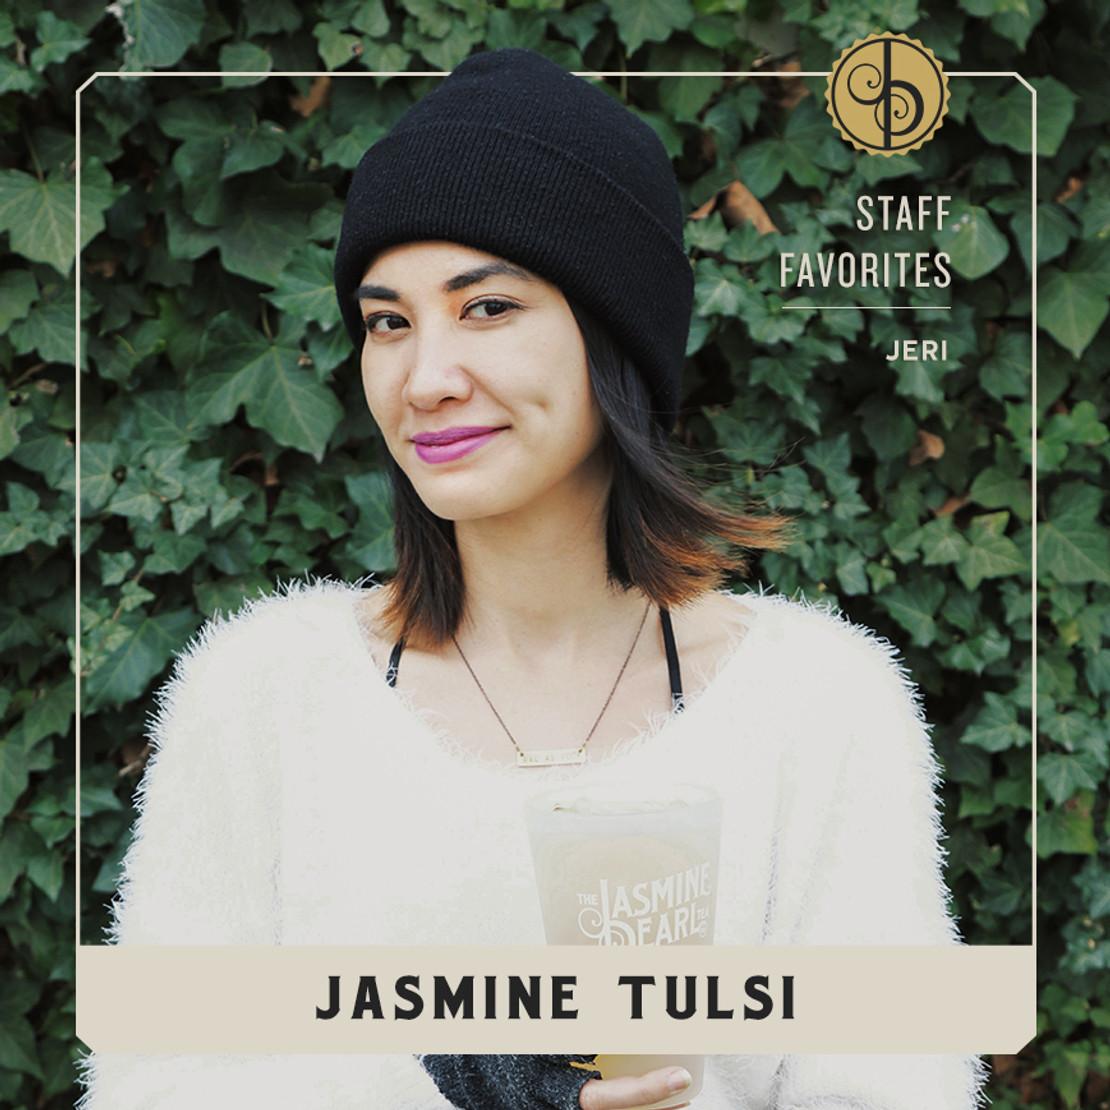 Staff Favorites: Jeri and Jasmine Tulsi